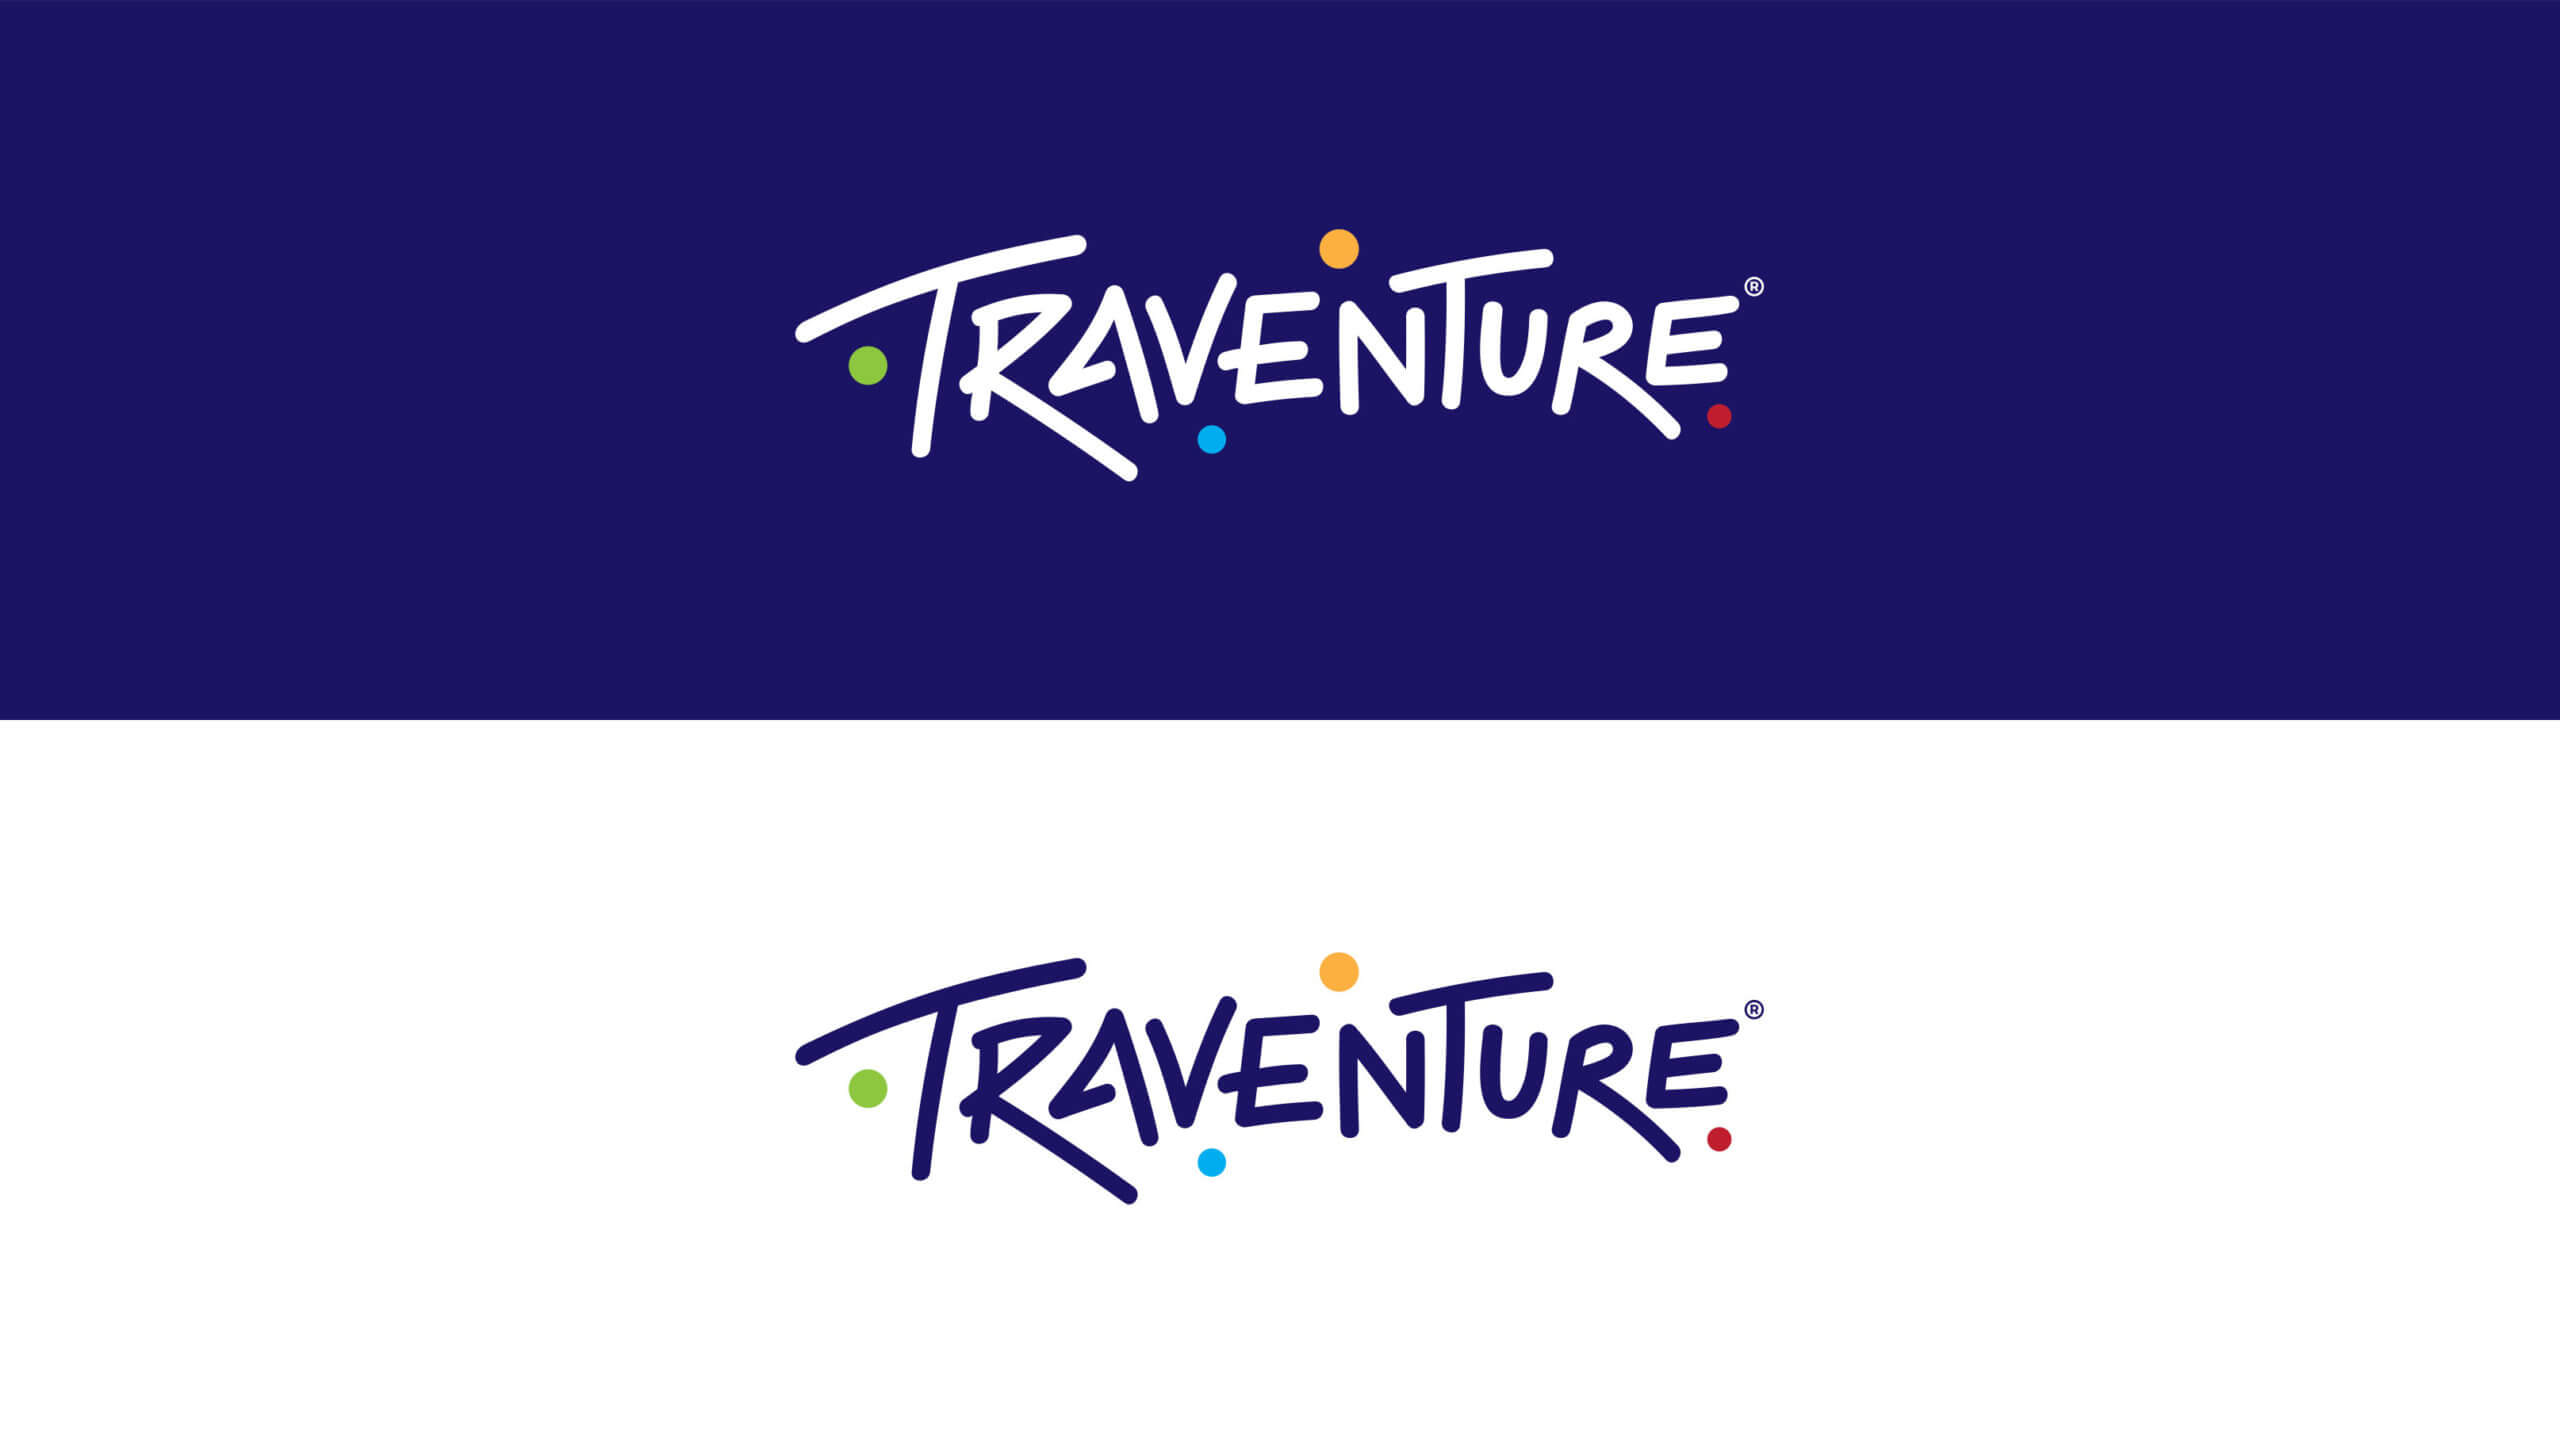 traventure logo